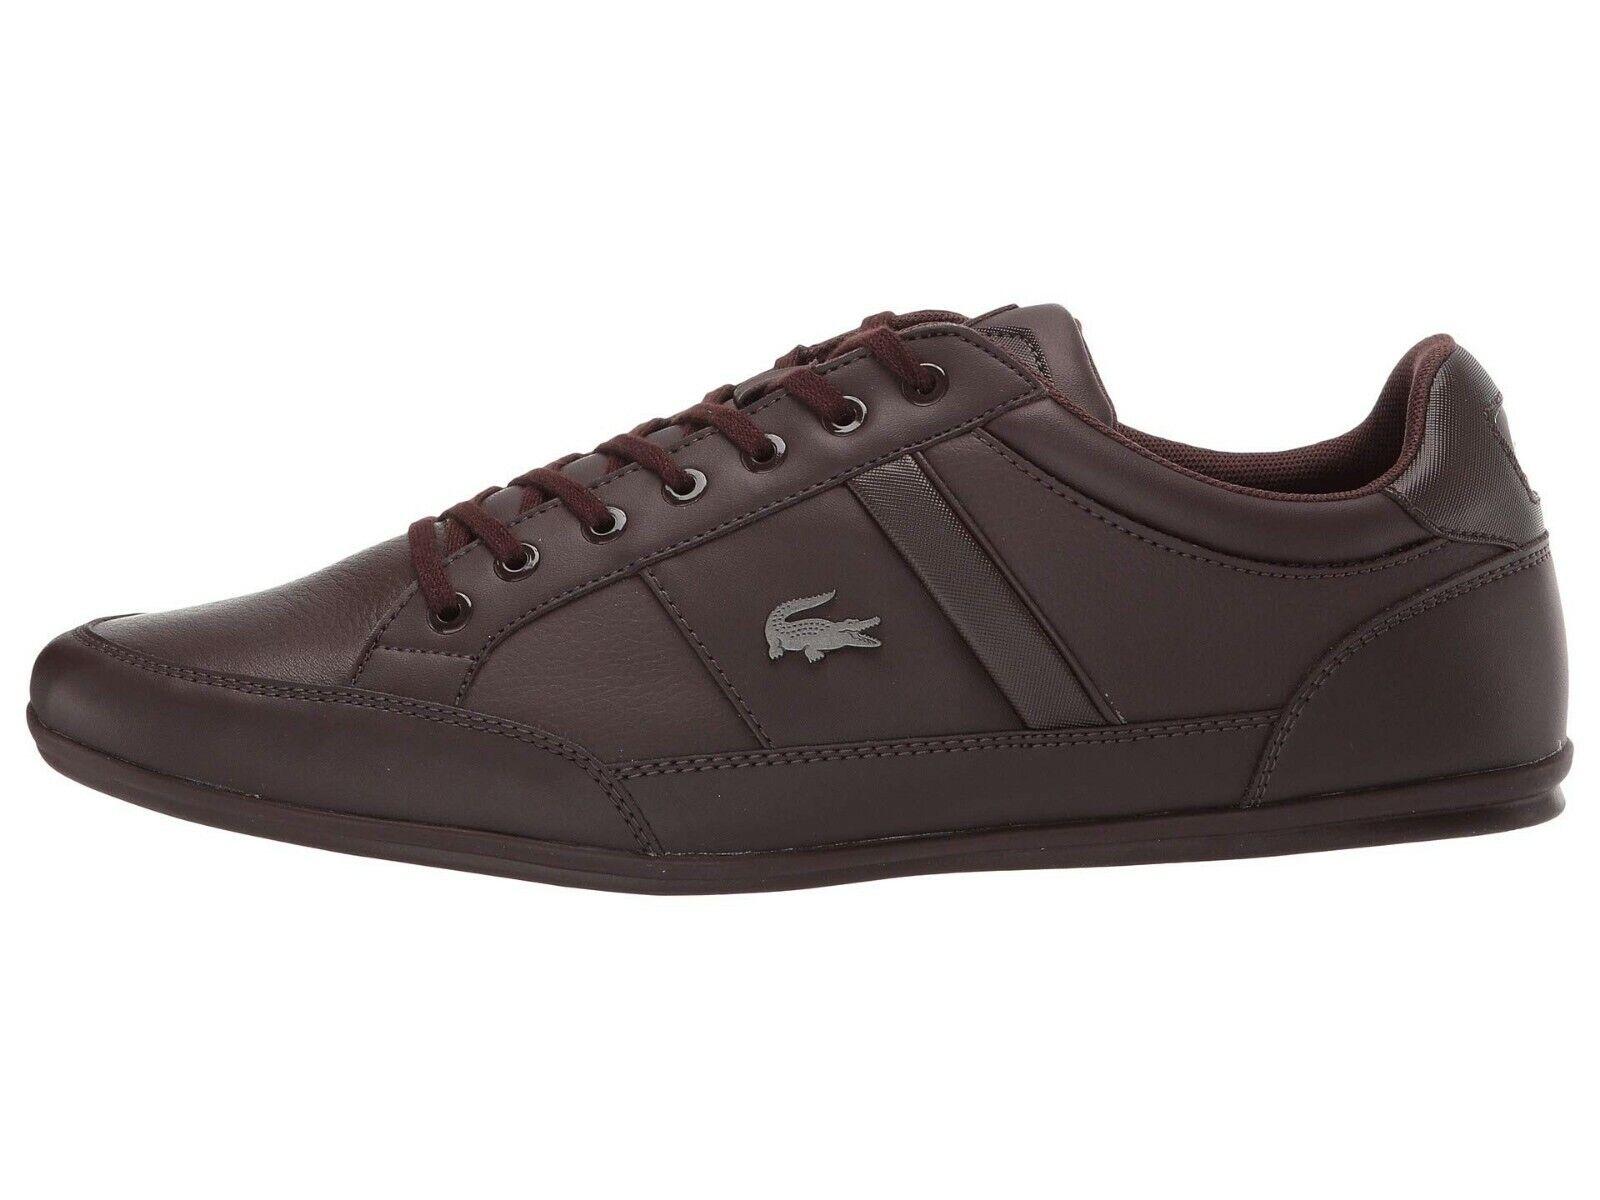 LACOSTE Chaymon BL Brown Croc Logo Leather Shoes Men's Fashion Sneakers